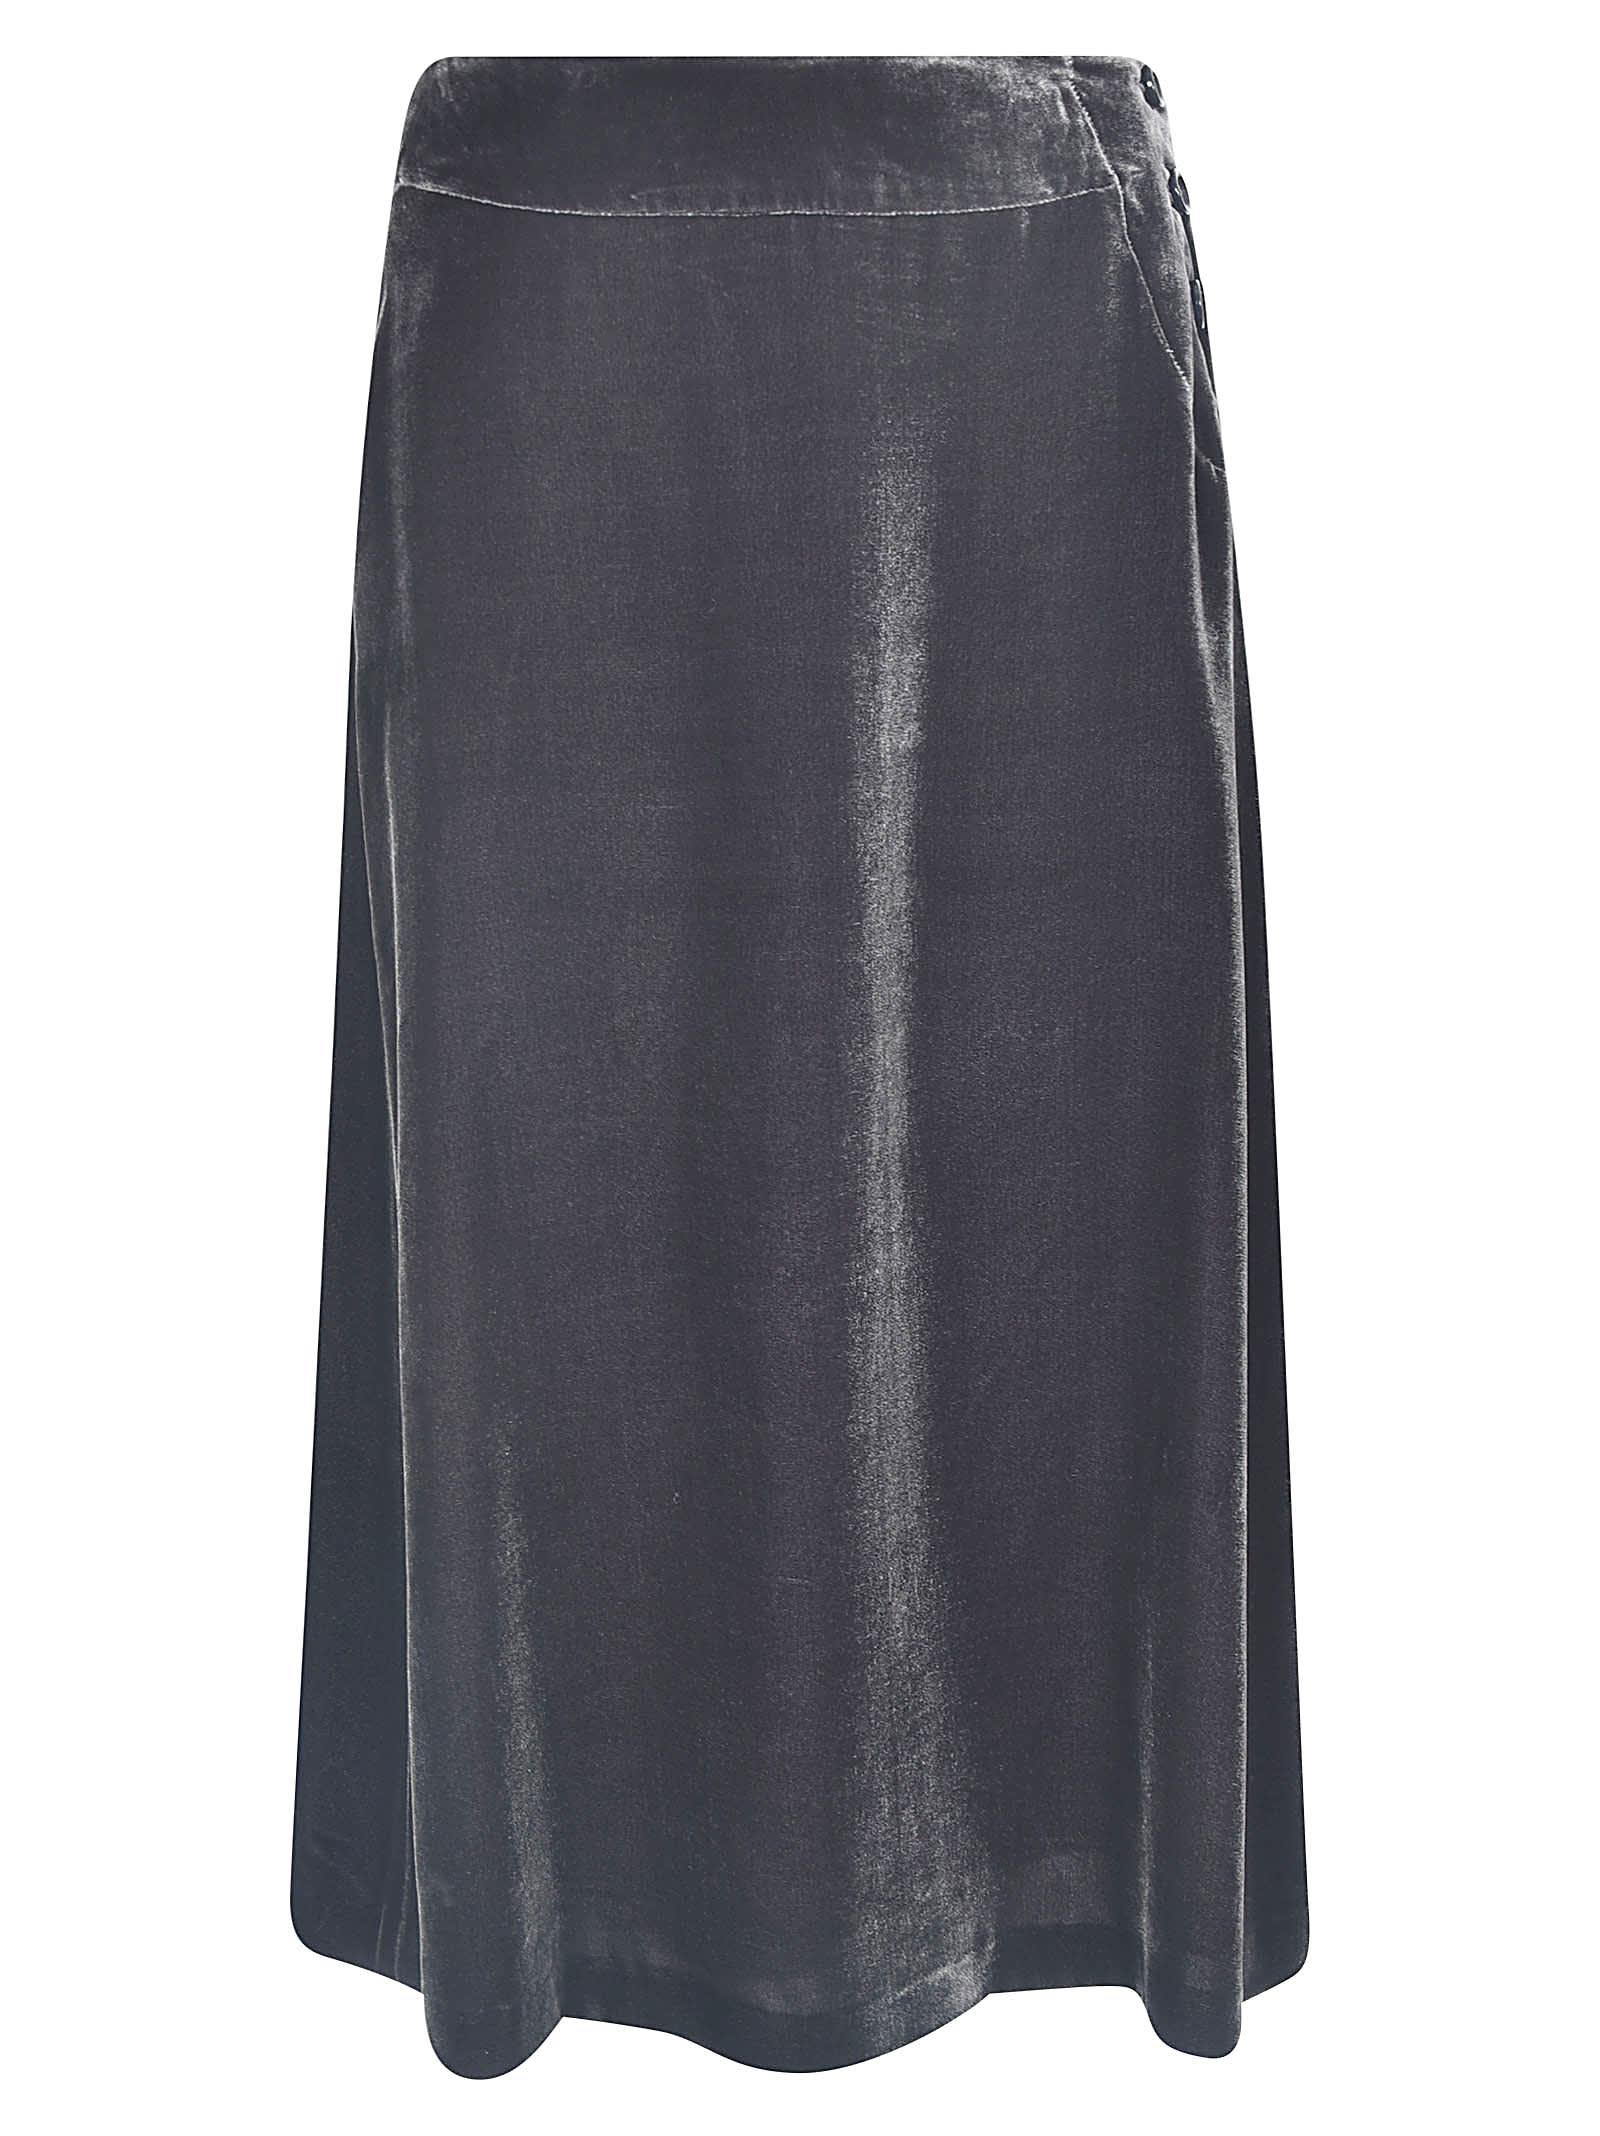 Aspesi Velluto Skirt